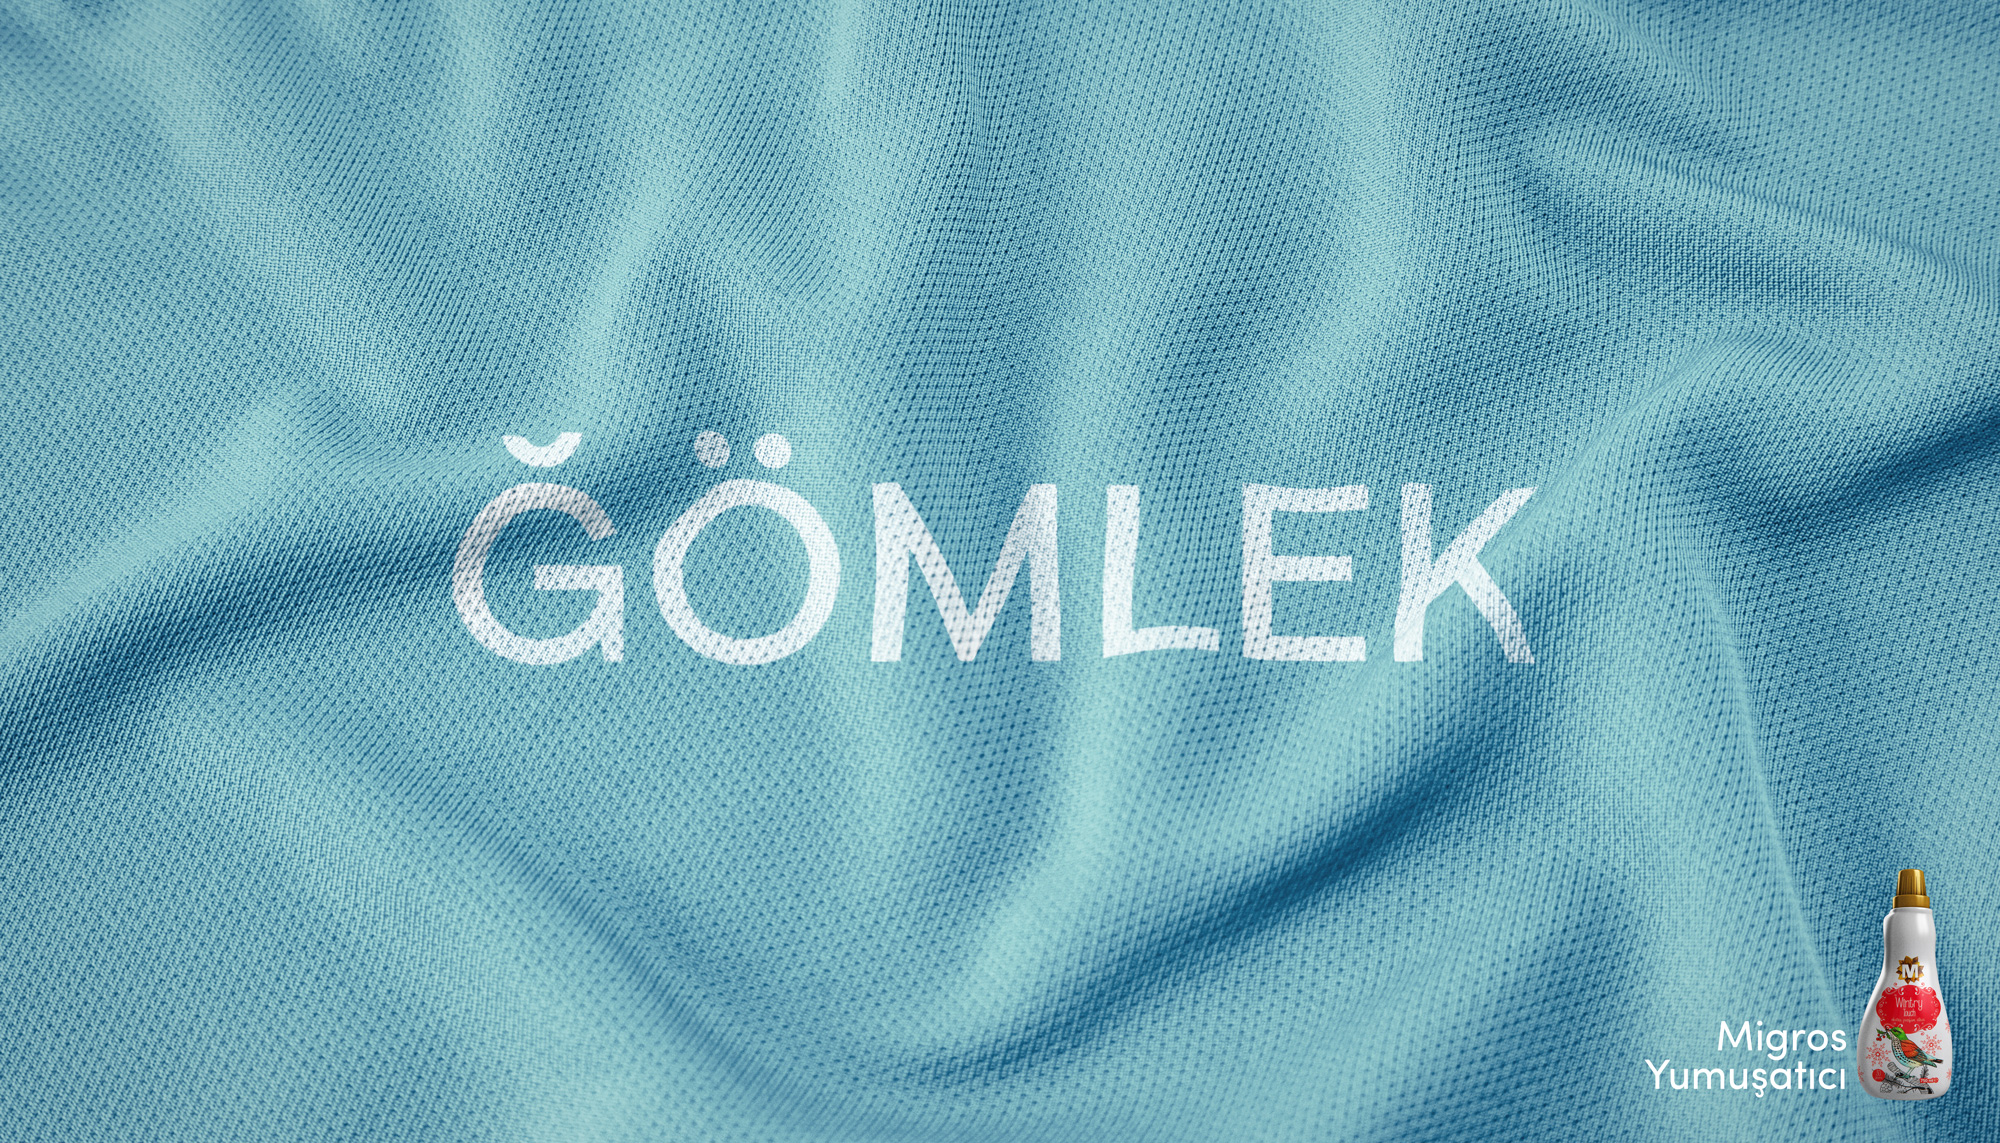 Migros-reklamlari-Yumusatici-Reklami-Turkiyenin-Reklamlari-ajans-marka-migros-reklami-çamaşır-deterjanı